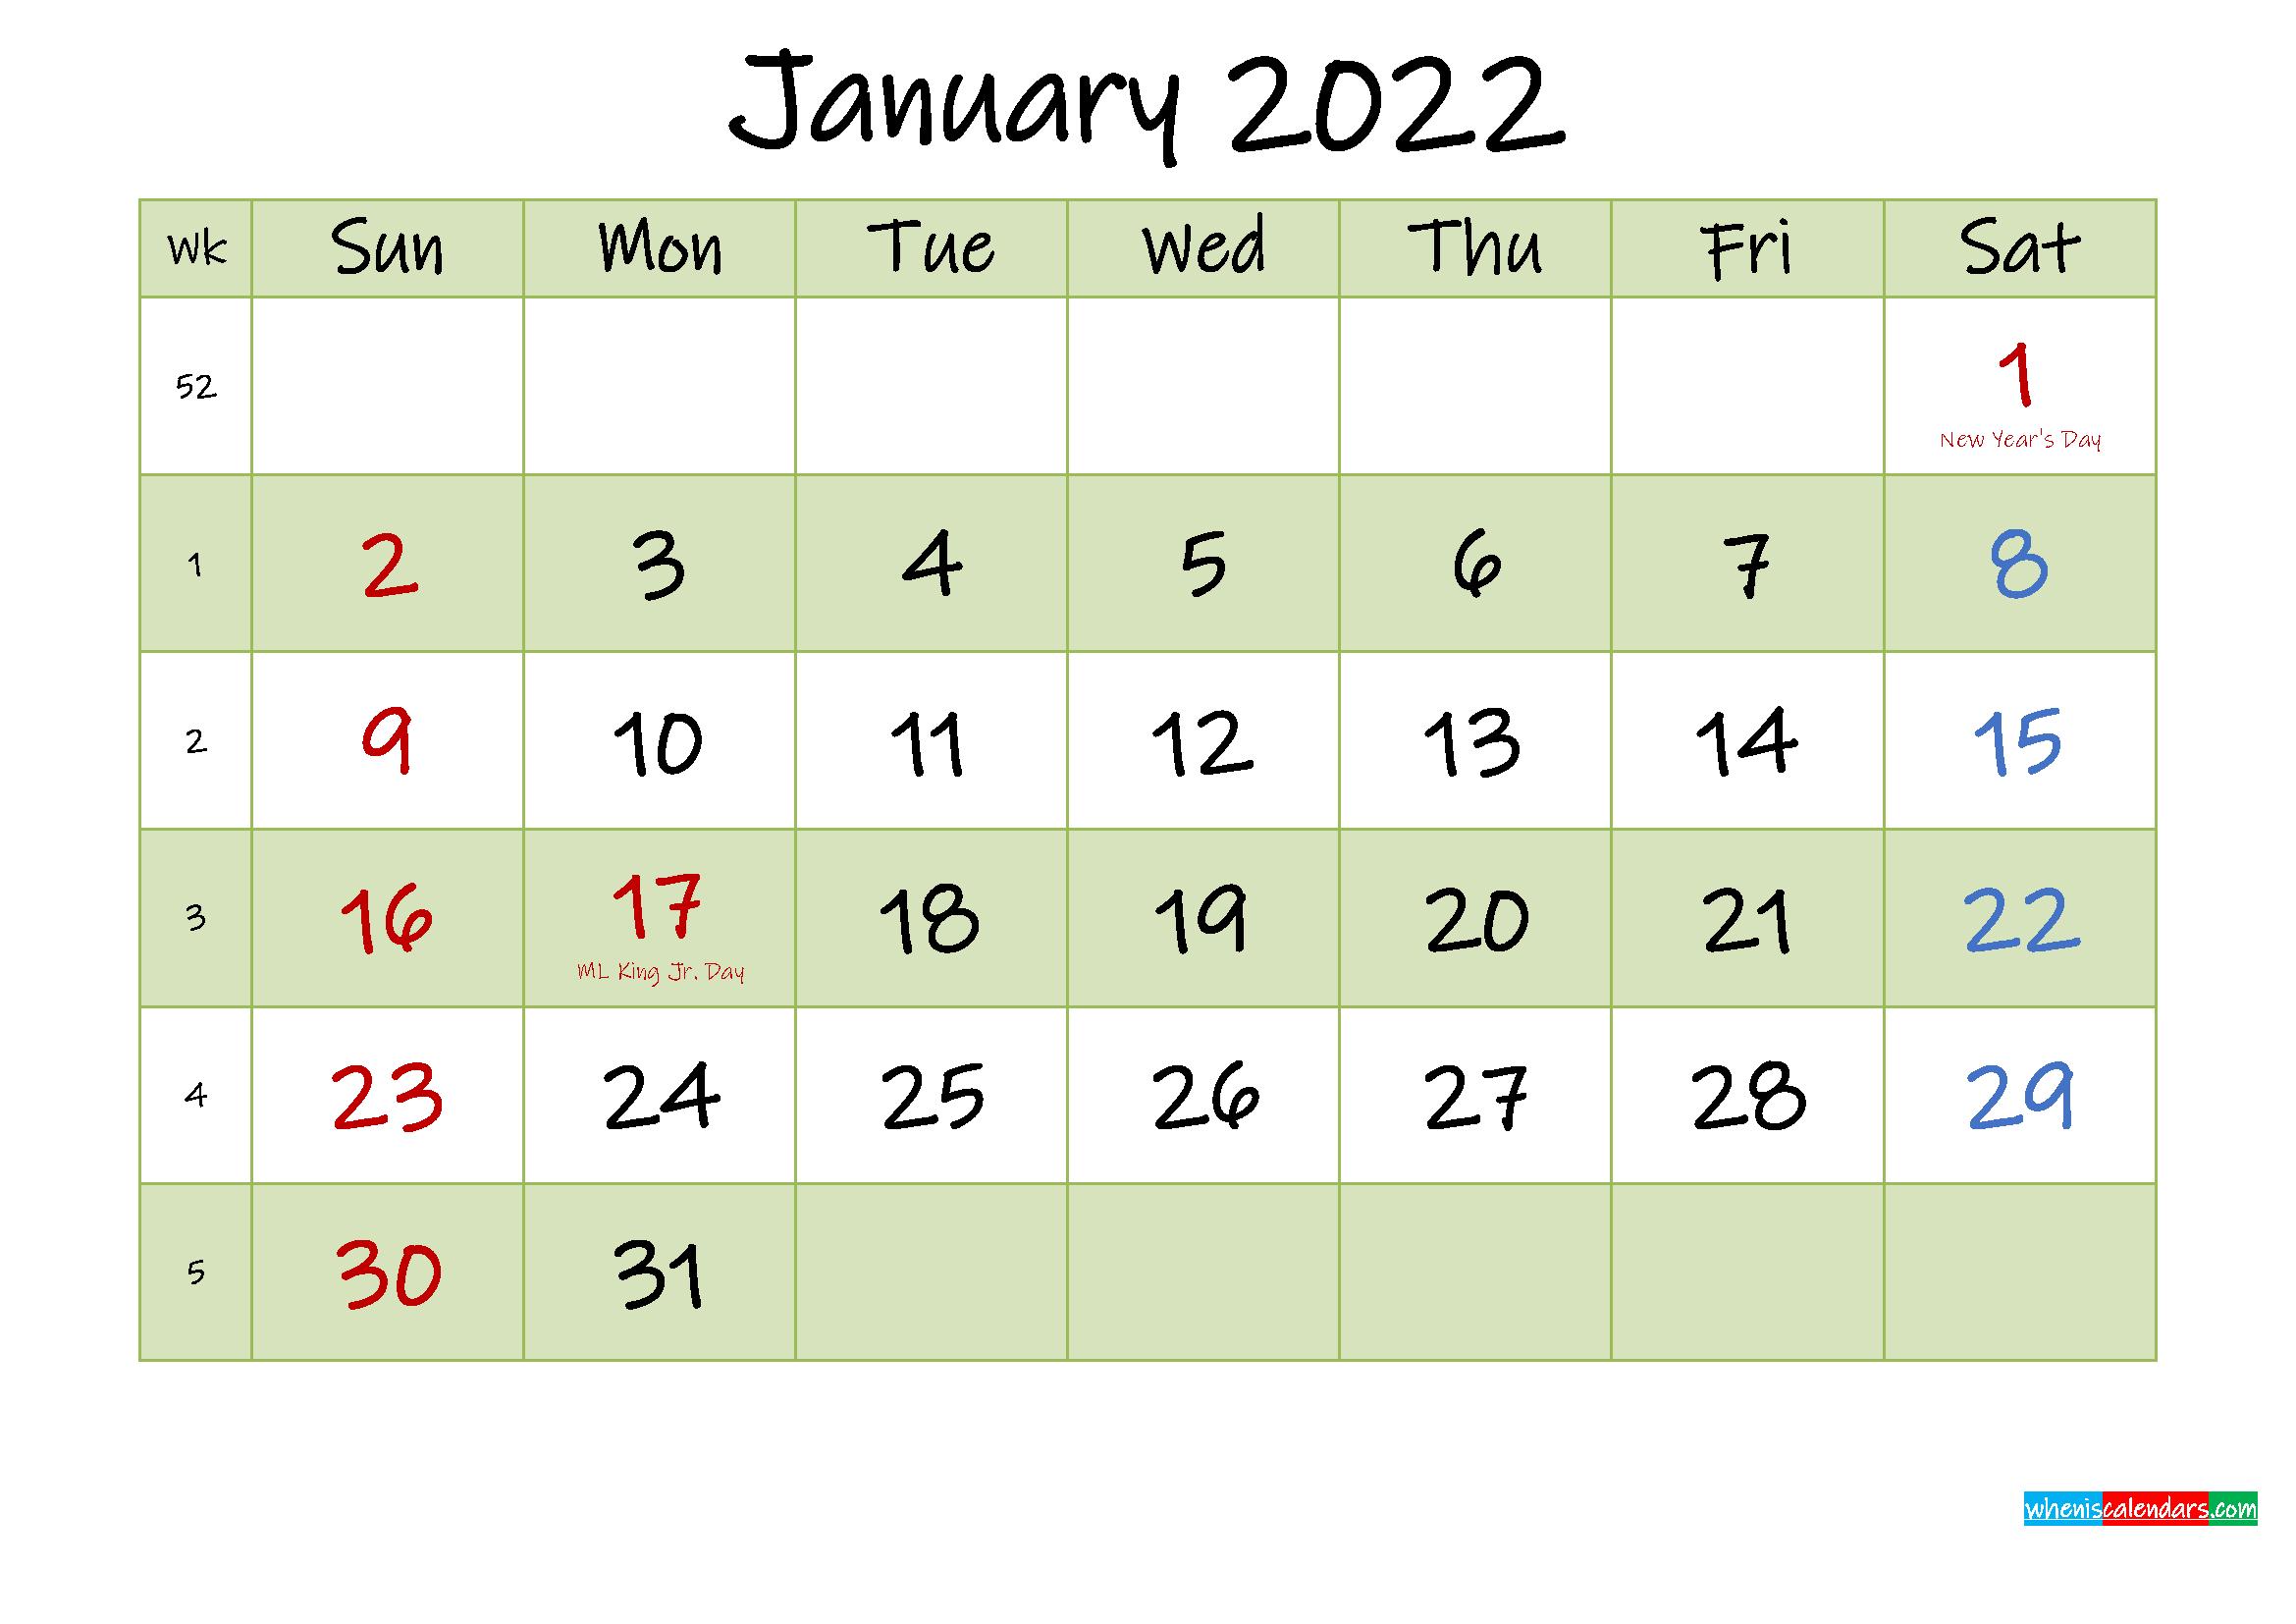 January 2022 Calendar With Holidays Printable - Template No.ink22M445 - Free Printable 2021